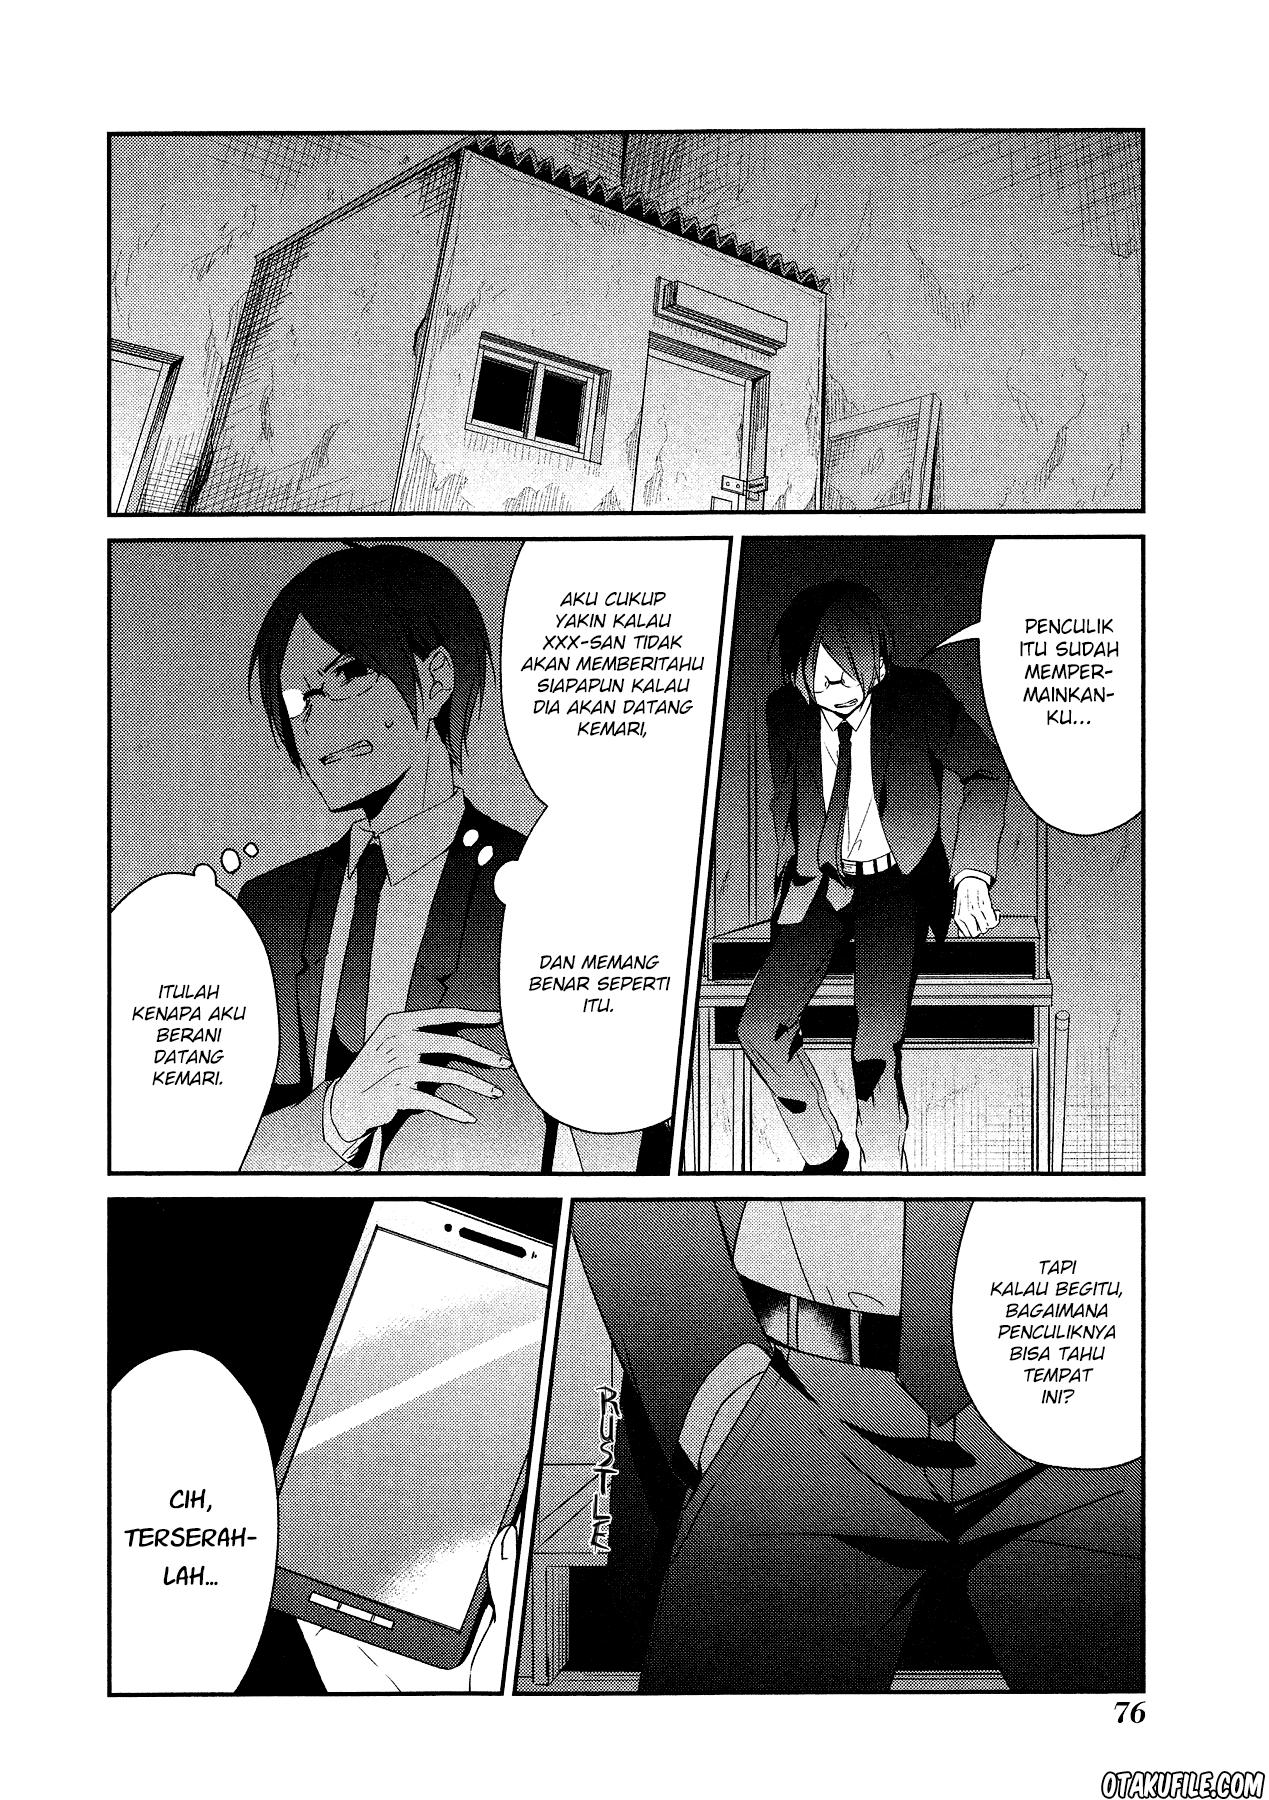 Komik sachi iro no one room 015 - chapter 15 16 Indonesia sachi iro no one room 015 - chapter 15 Terbaru 12|Baca Manga Komik Indonesia